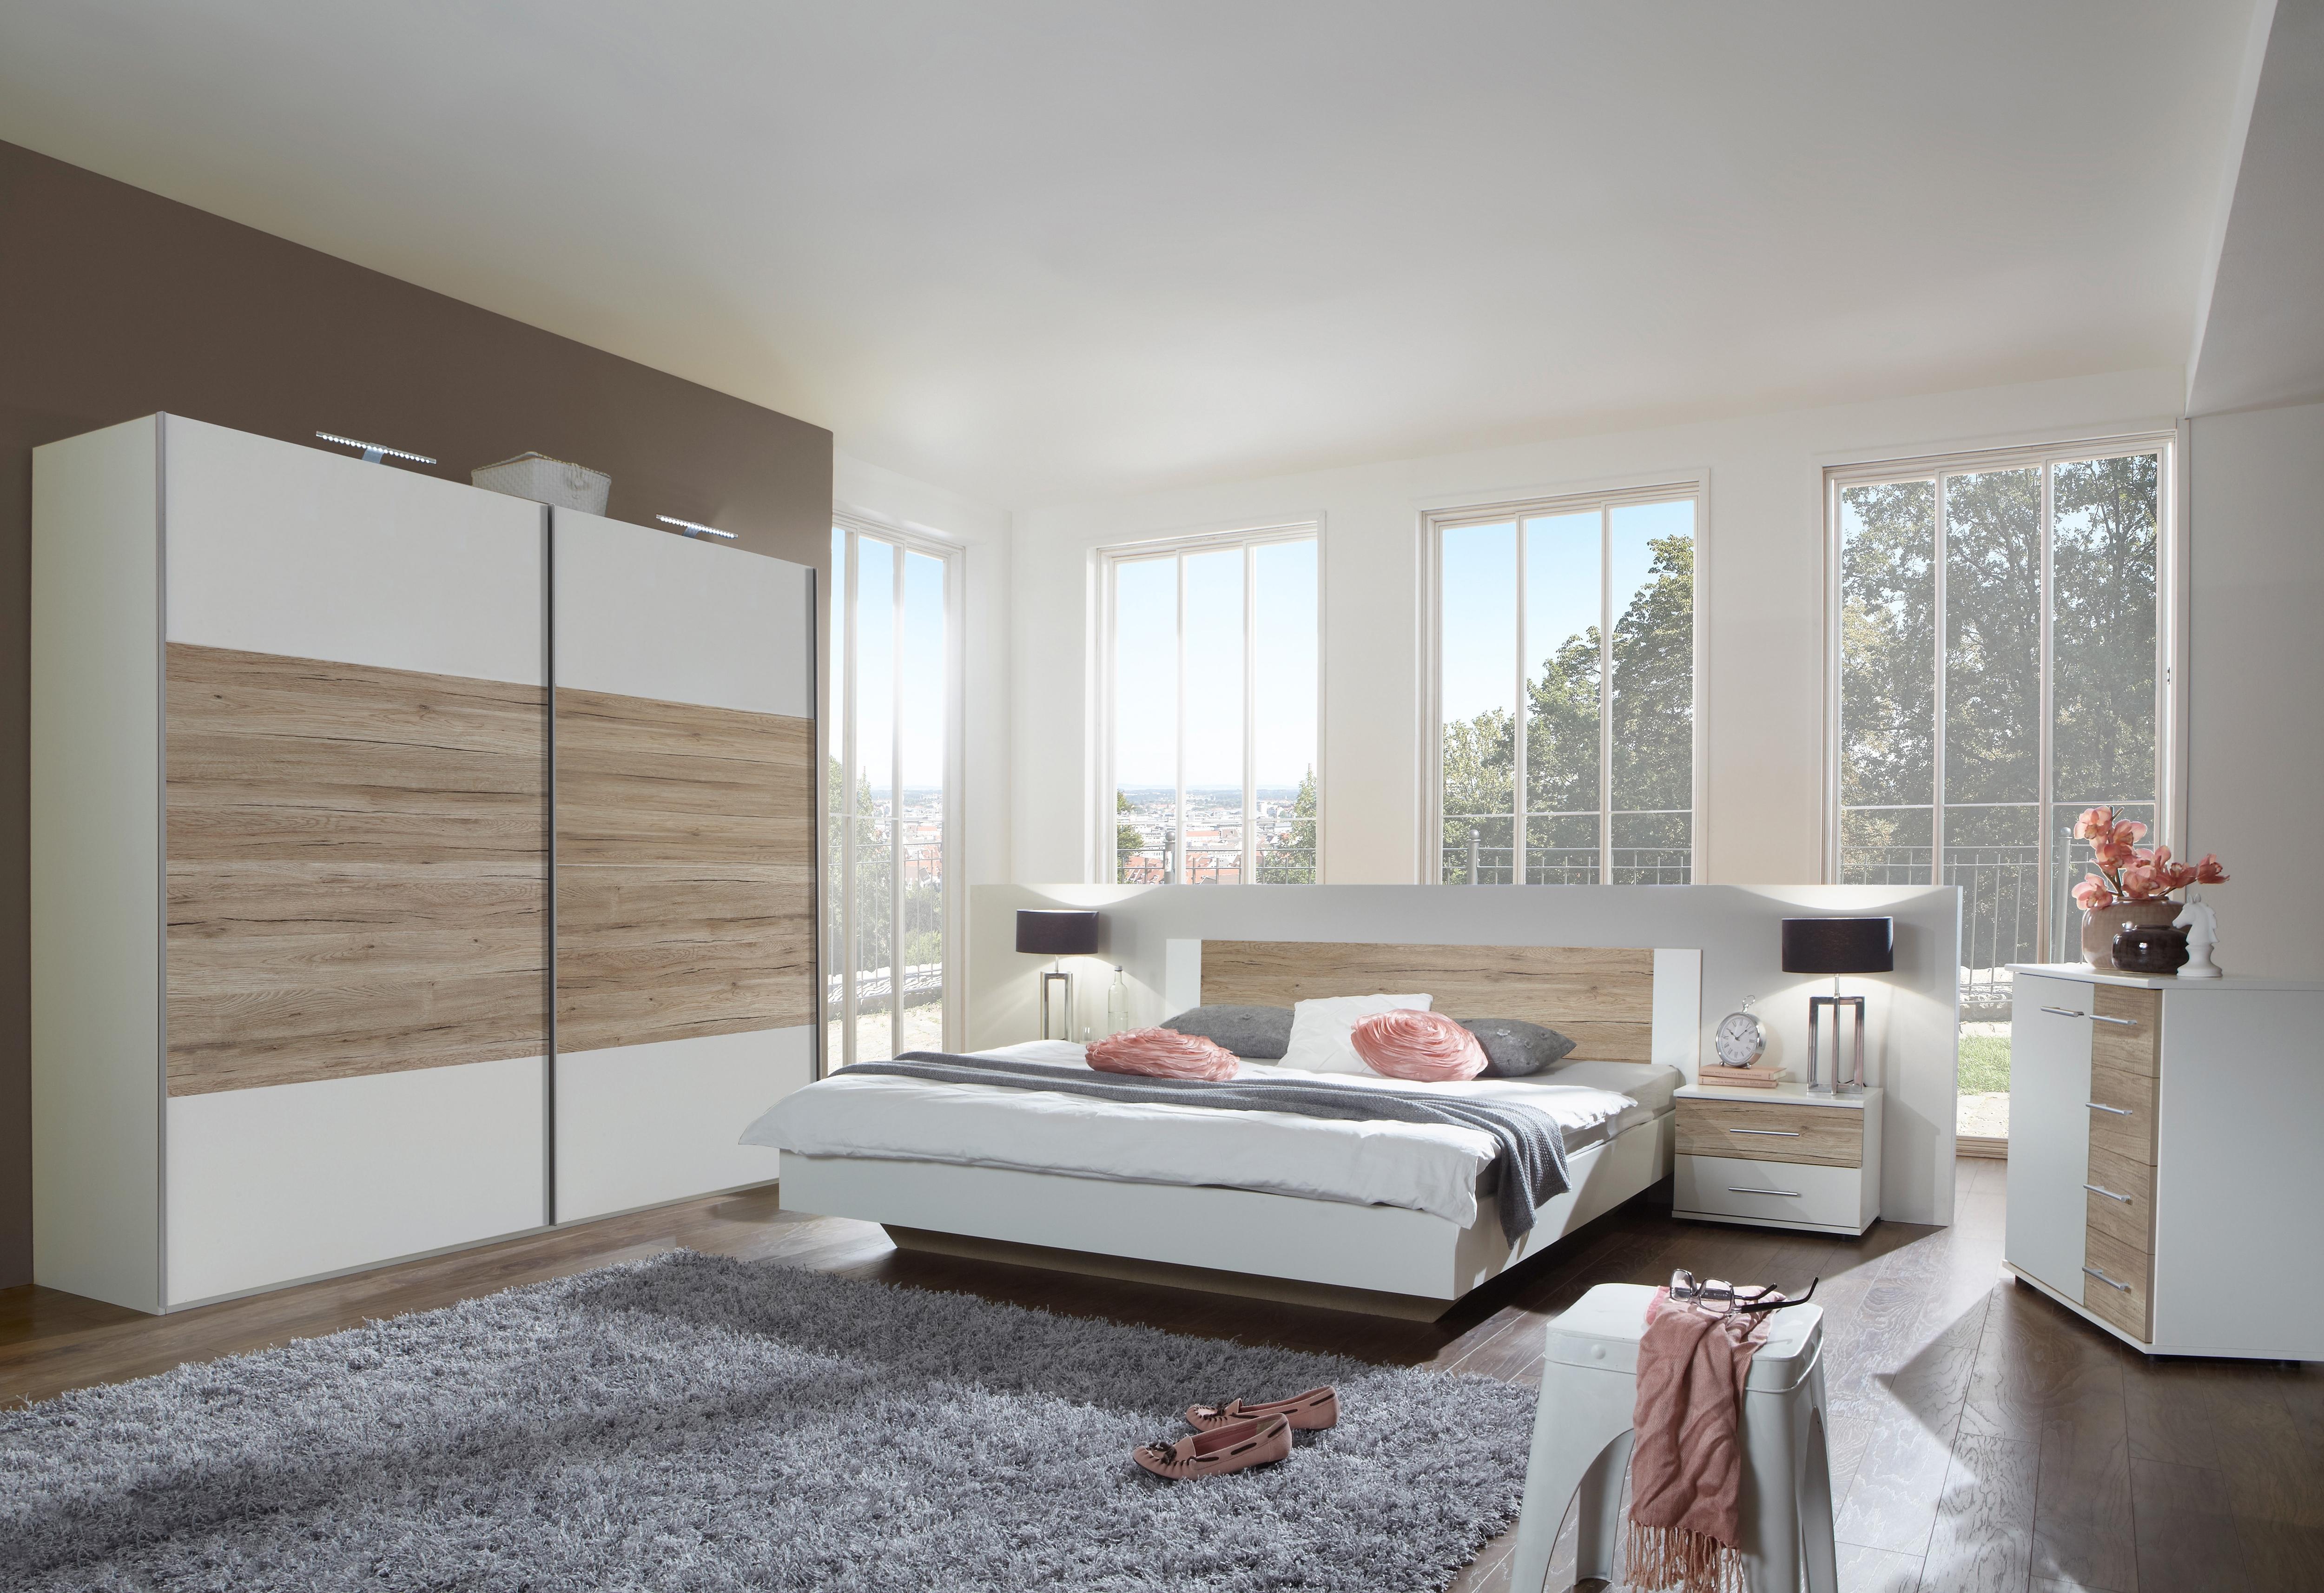 Slaapkamer Franziska In 4-delige Set Makkelijk Besteld